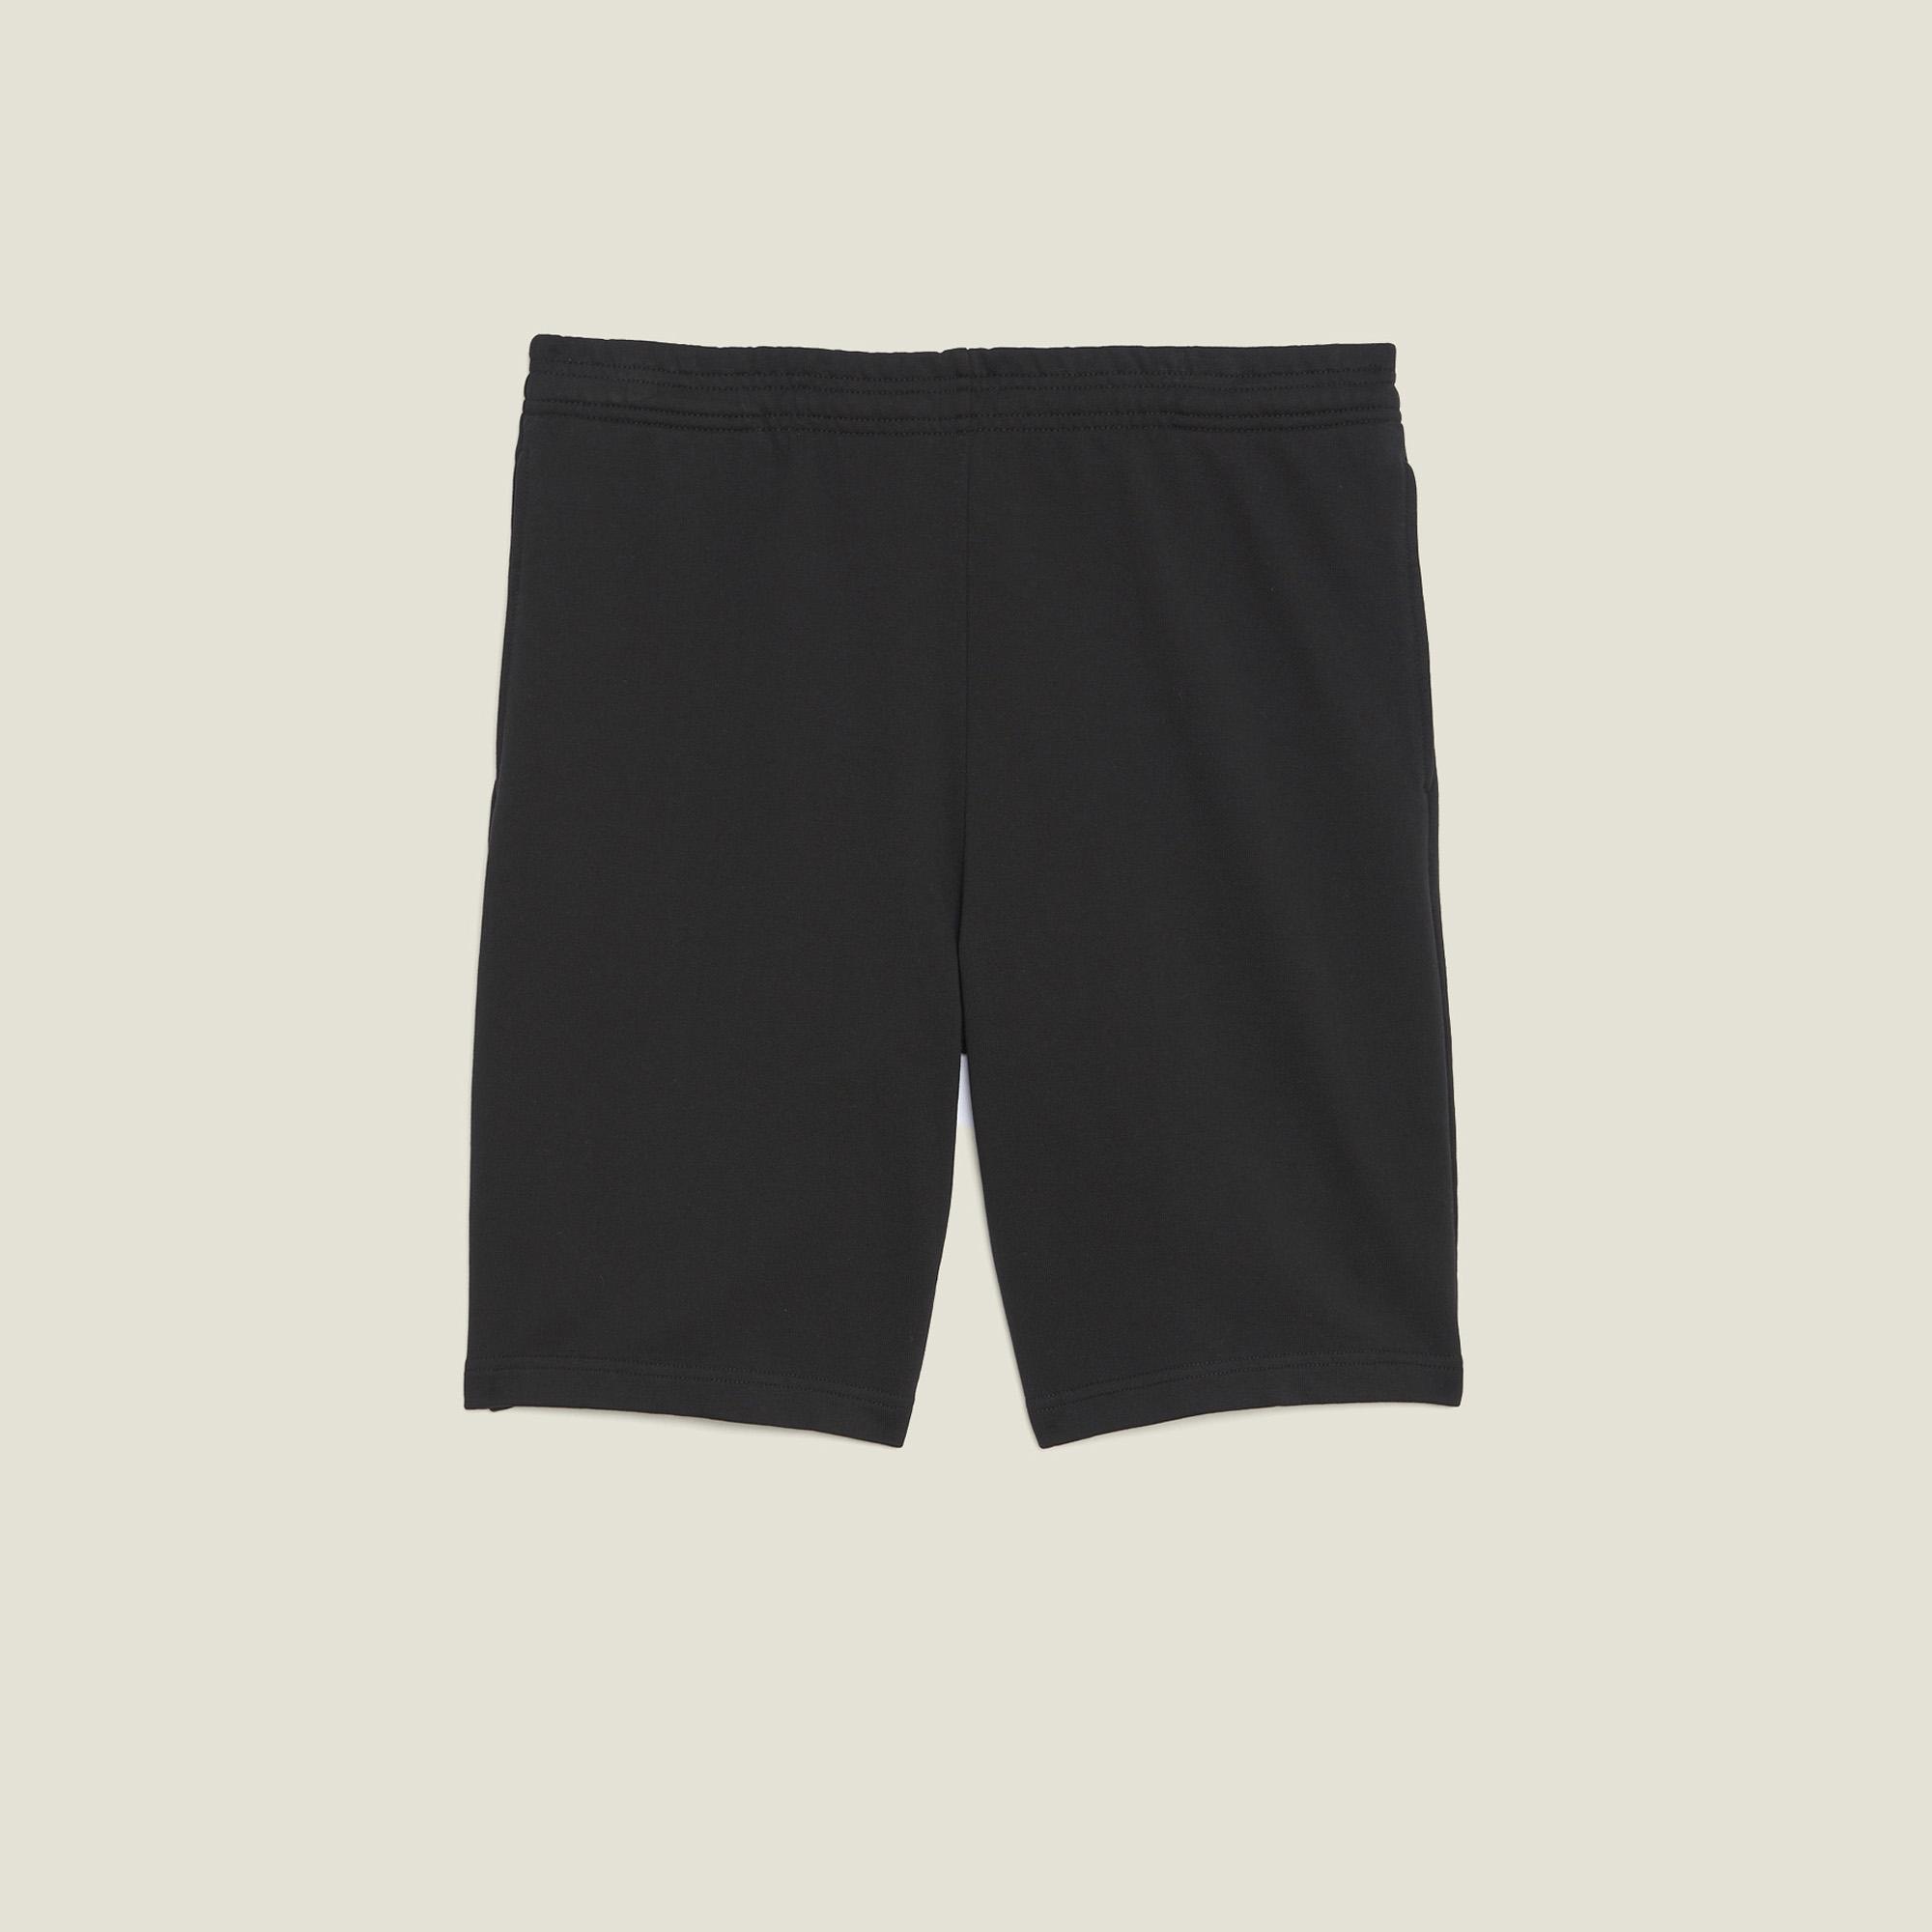 P6511s Paris amp; Pantalons Short Sandro Shorts Jersey En qwZETgx08